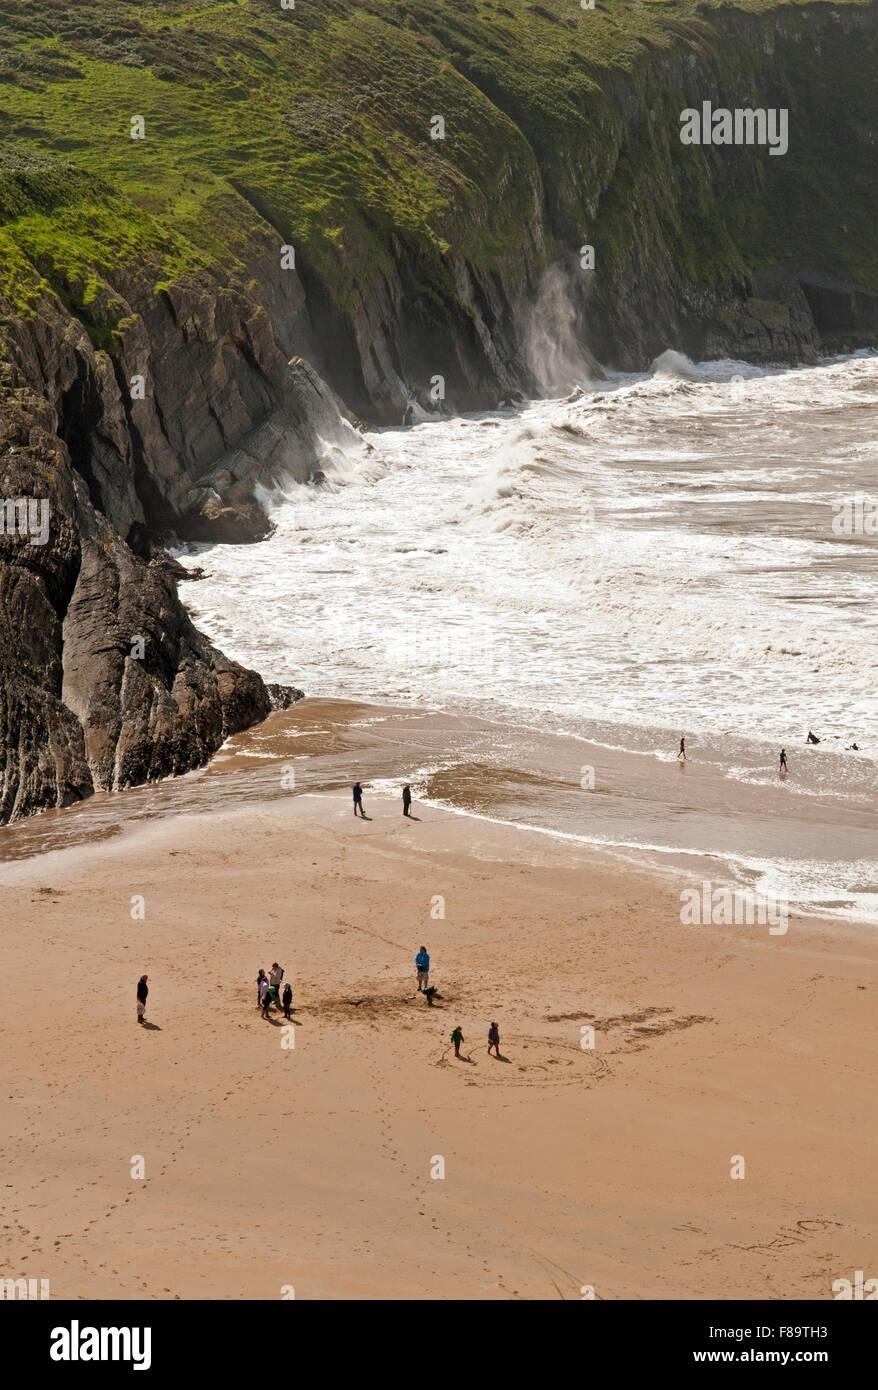 Mwnt Beach on the Ceredigion, or Cardiganshire, coast in West Wales, UK - Stock Image